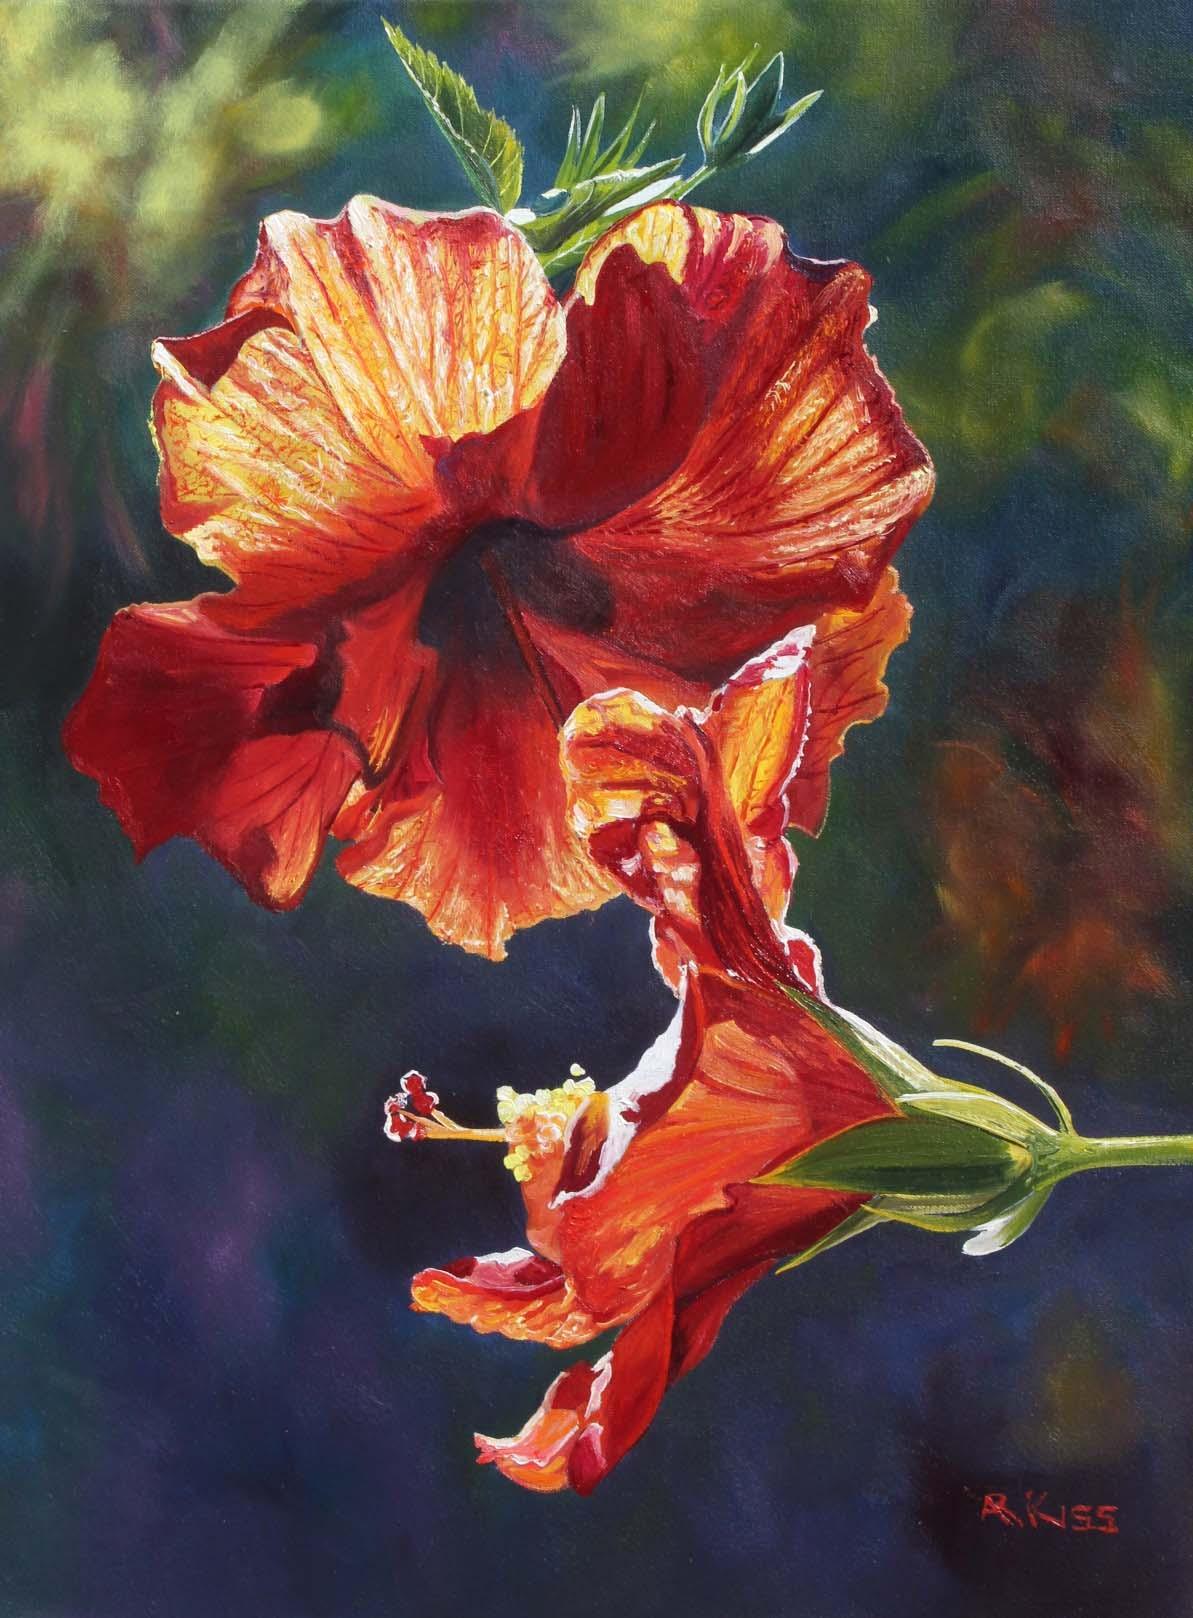 Maui Memories - Hibiscus - Andrew Kiss